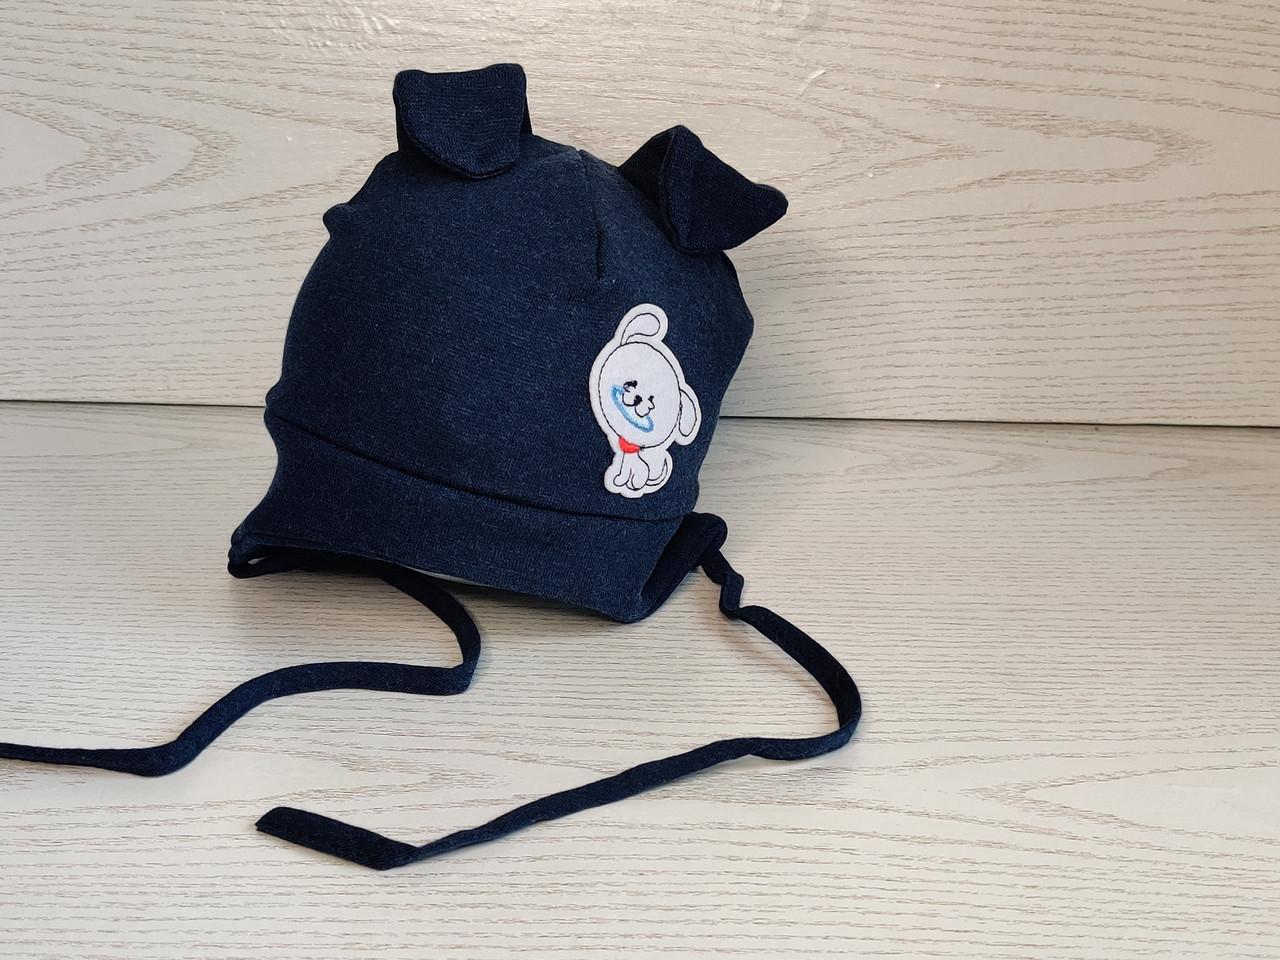 Трикотажная шапка для мальчика на завязках с собачкой Размер 42-44 см Возраст 4-8 месяцев